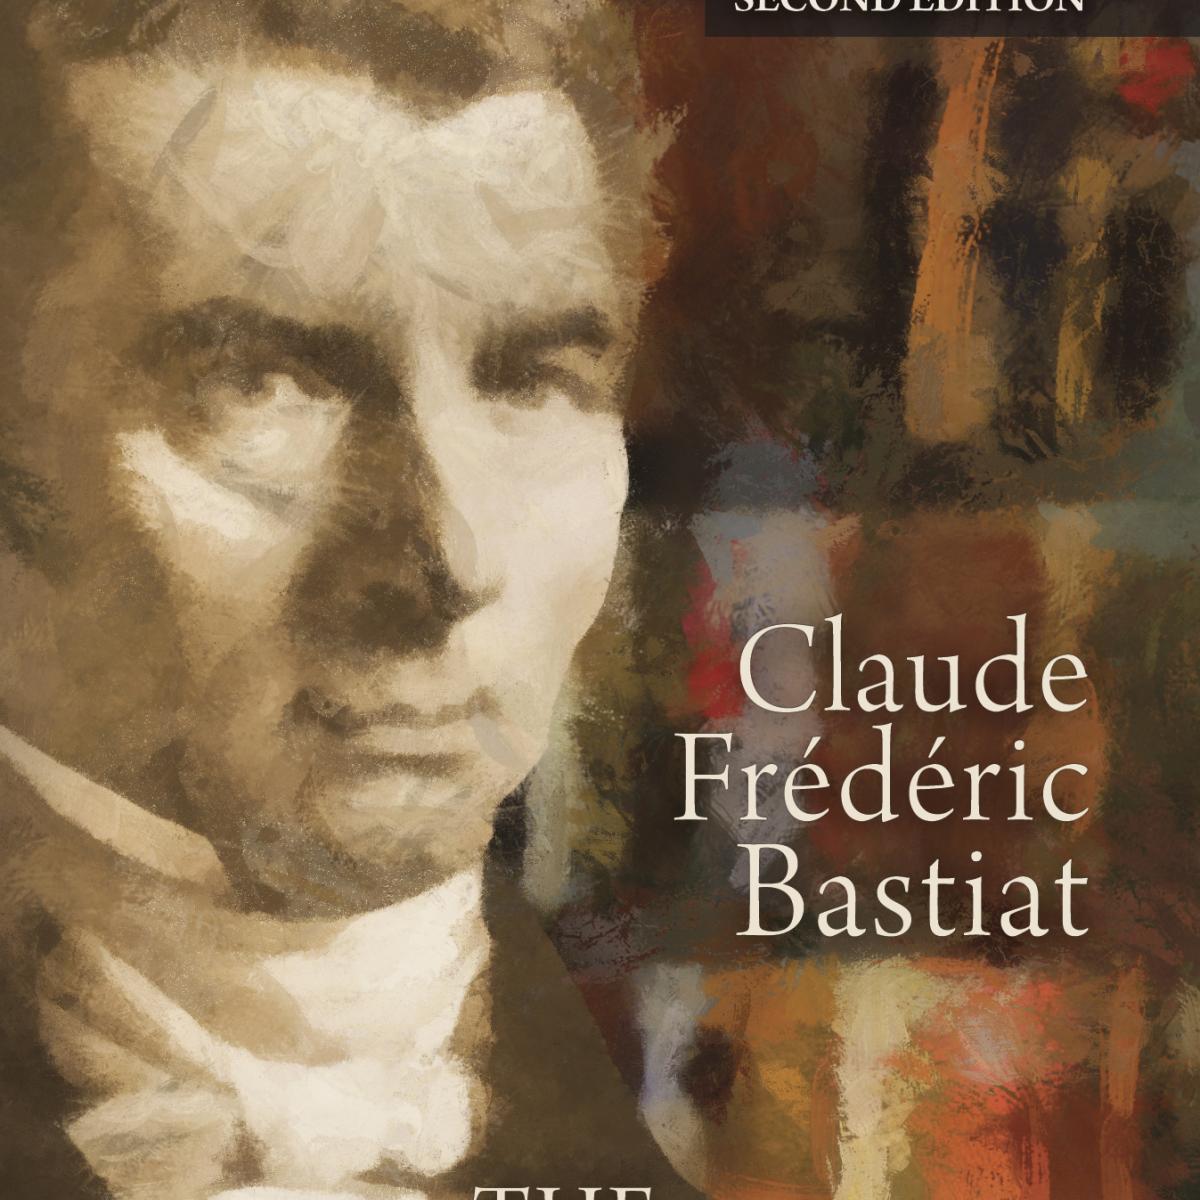 The Bastiat Collection | Mises Institute